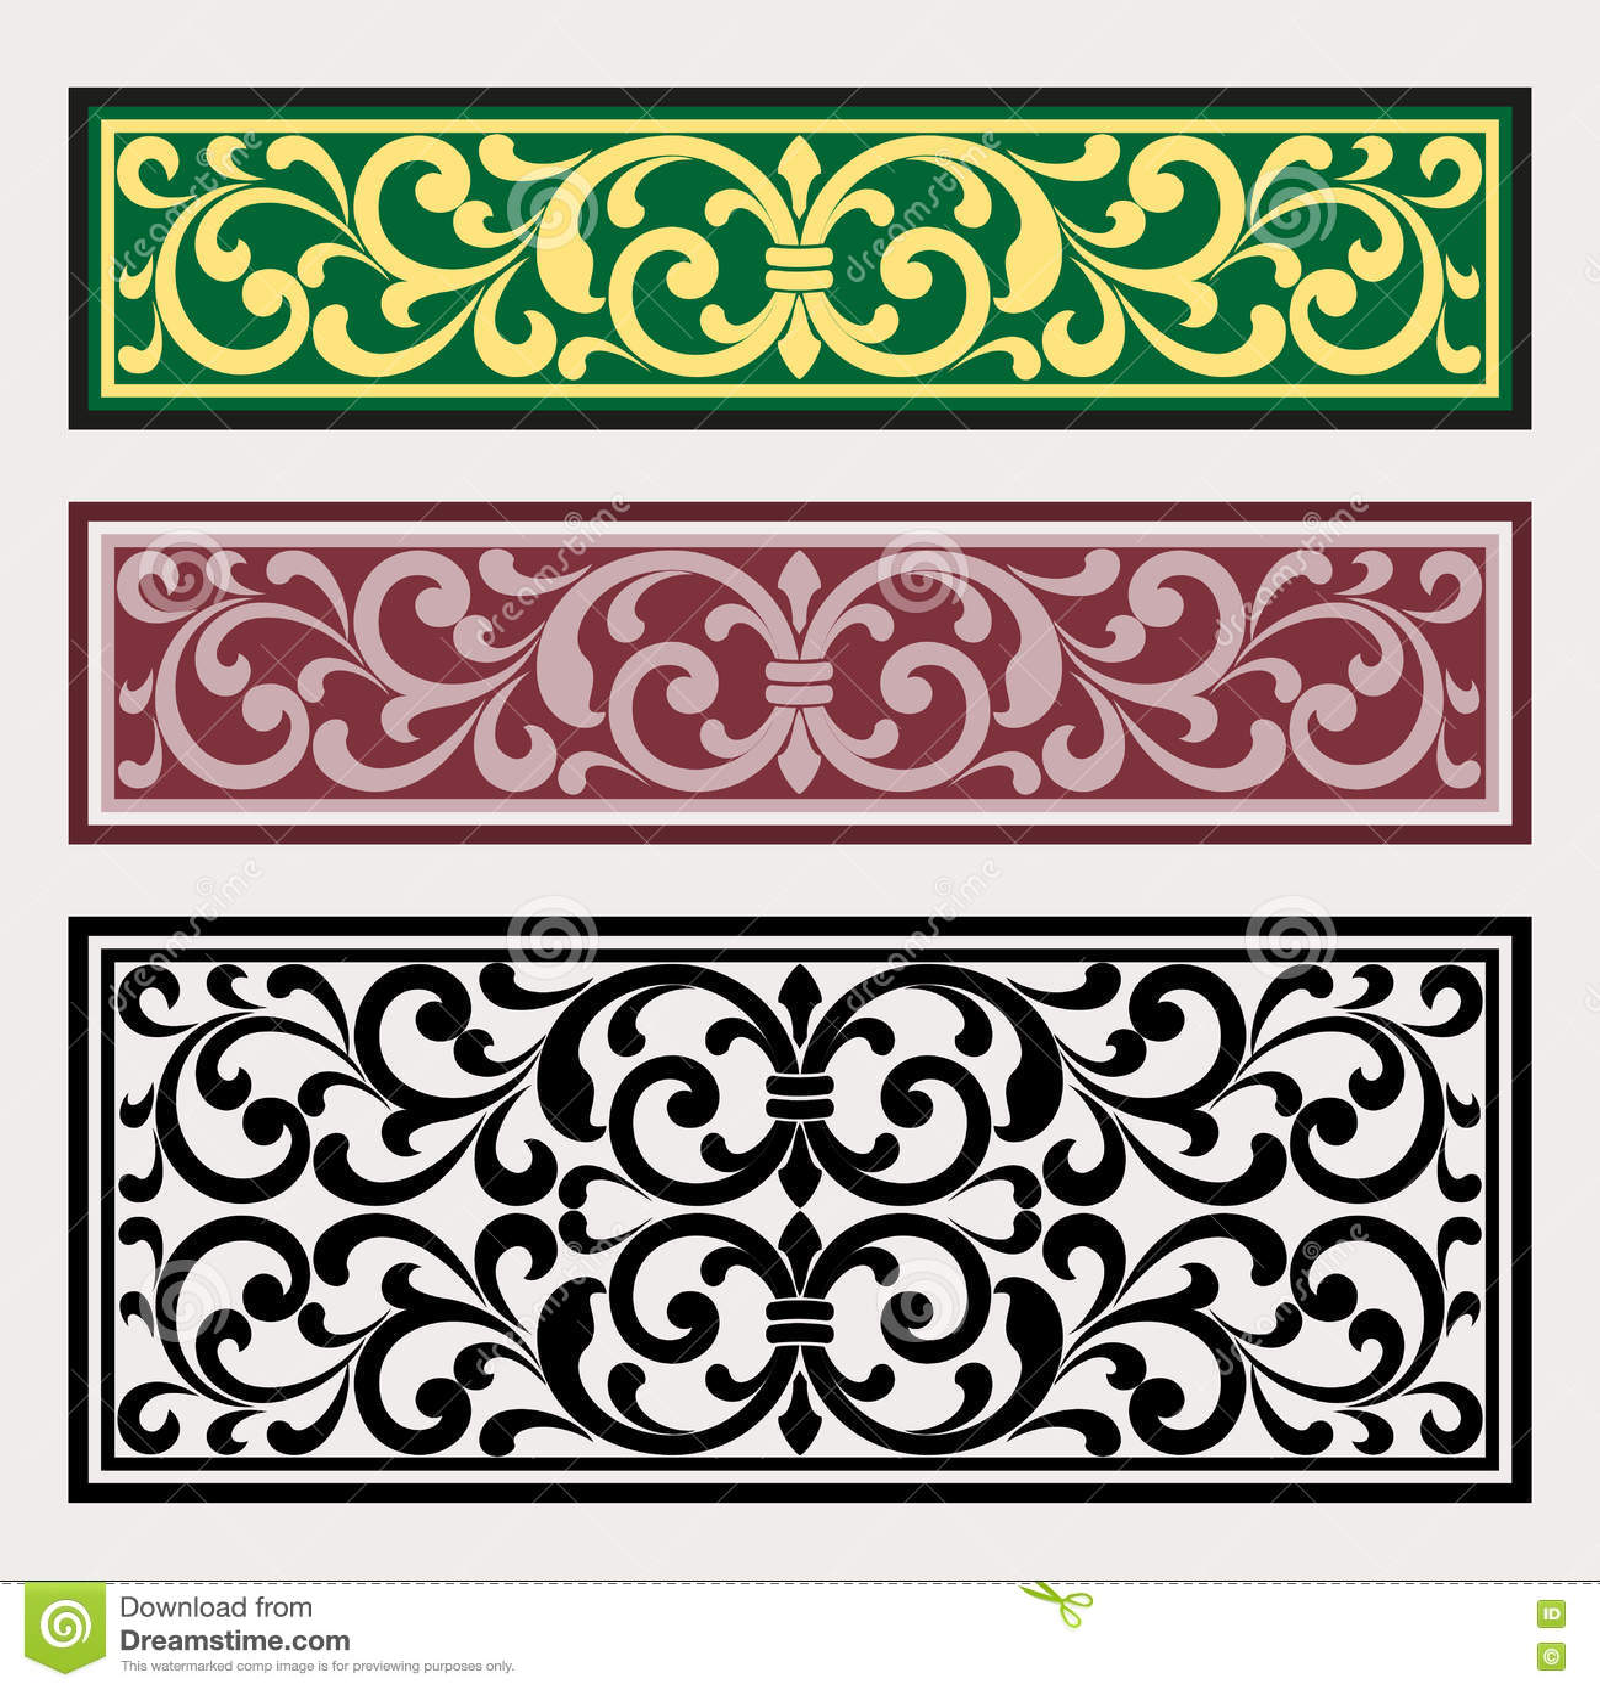 Retro Border Stencils : Vector vintage border frame logo engraving with retro